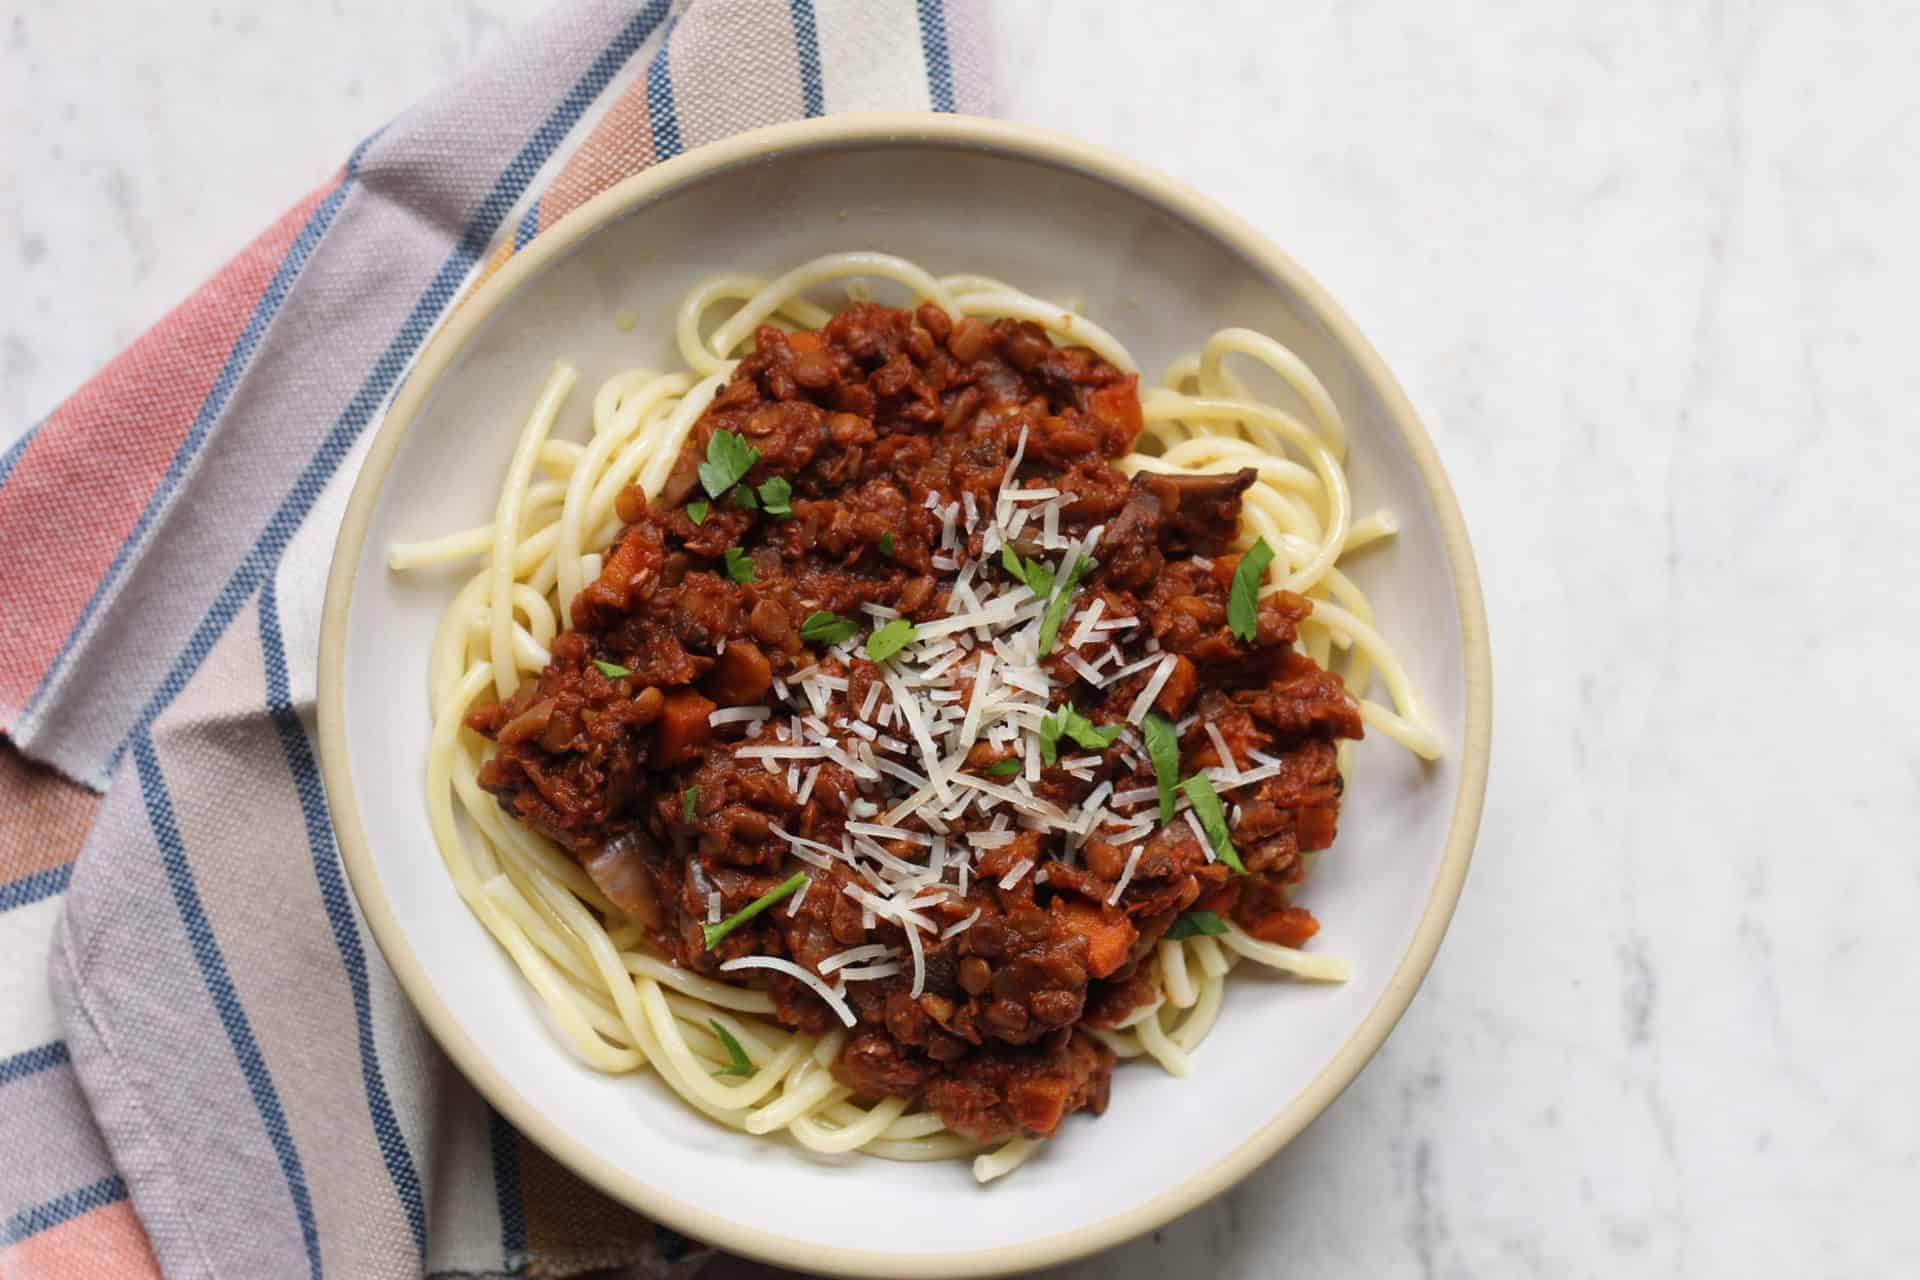 Dinner, Slow Cooker, Quick & Easy, Plant Based, Meatless, Vegetarian, Mushrooms, Lentils